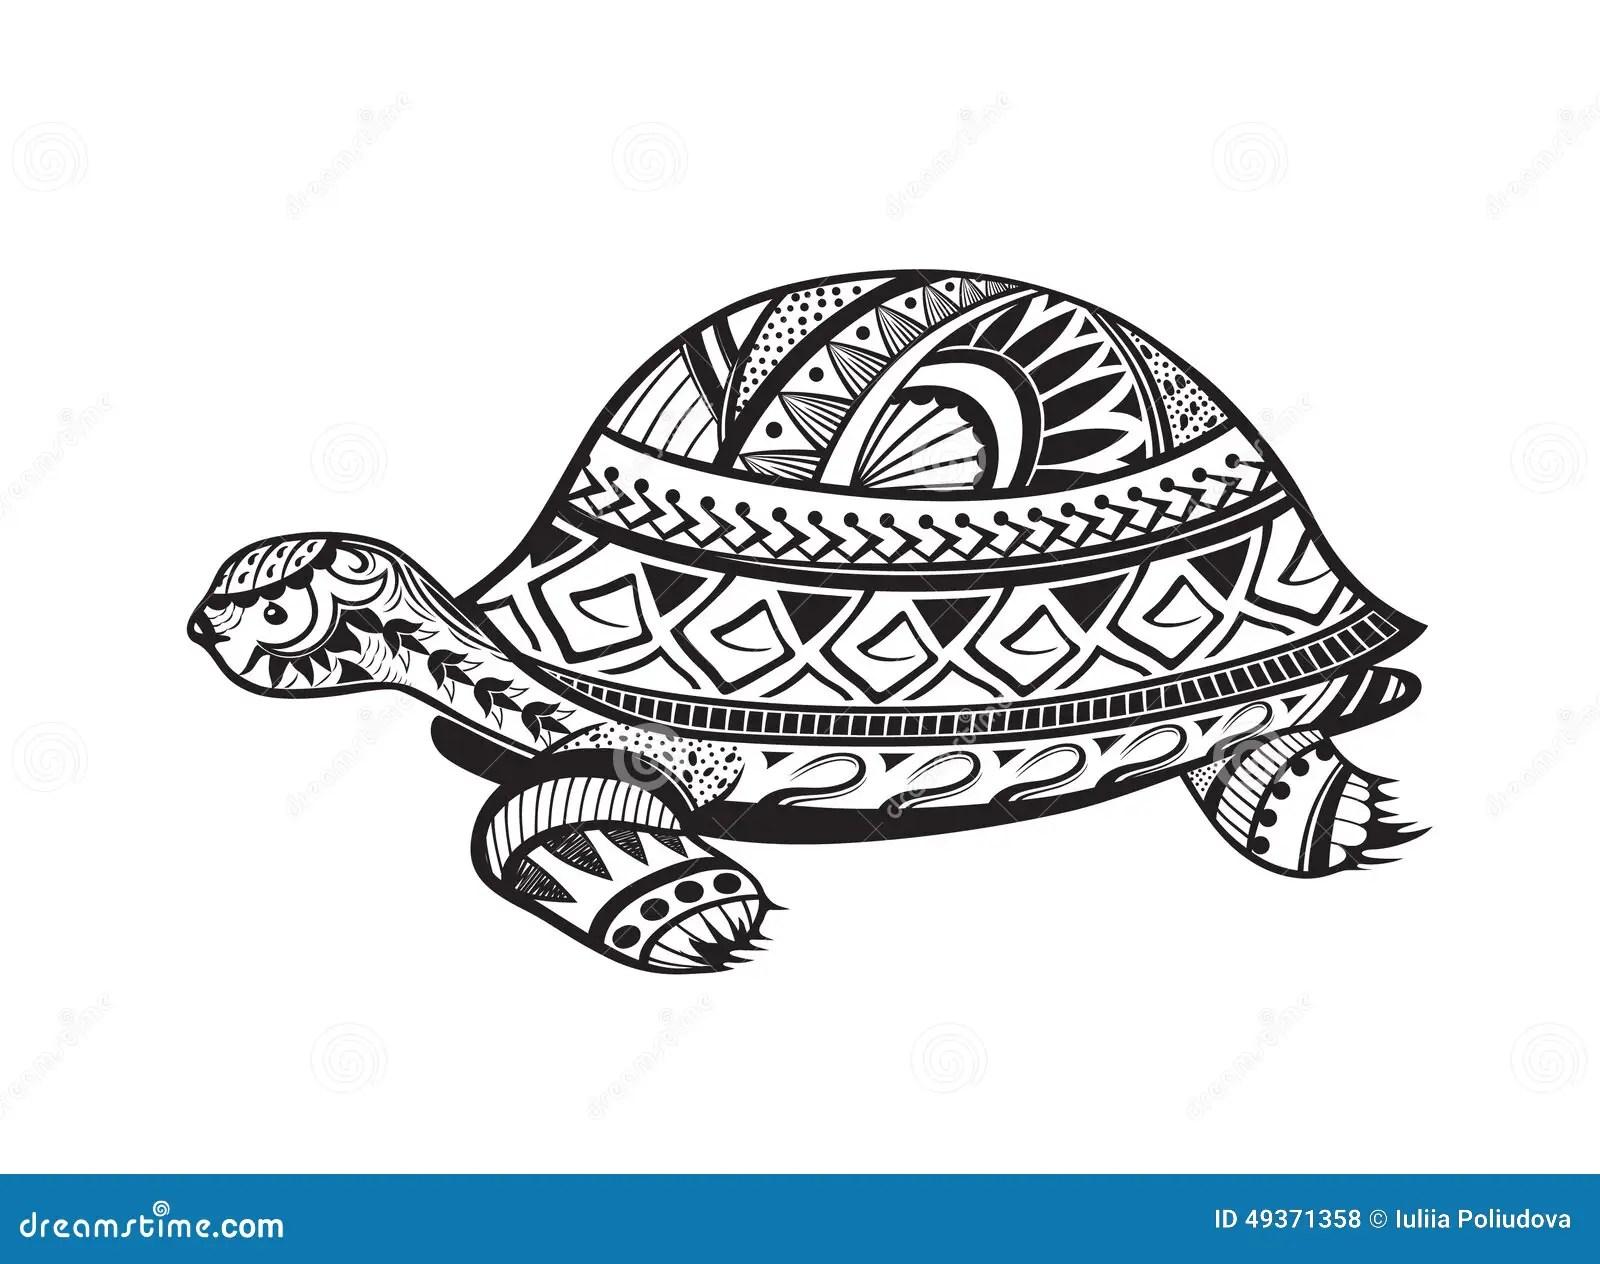 Ethnic Ornamented Tortoise Stock Illustration